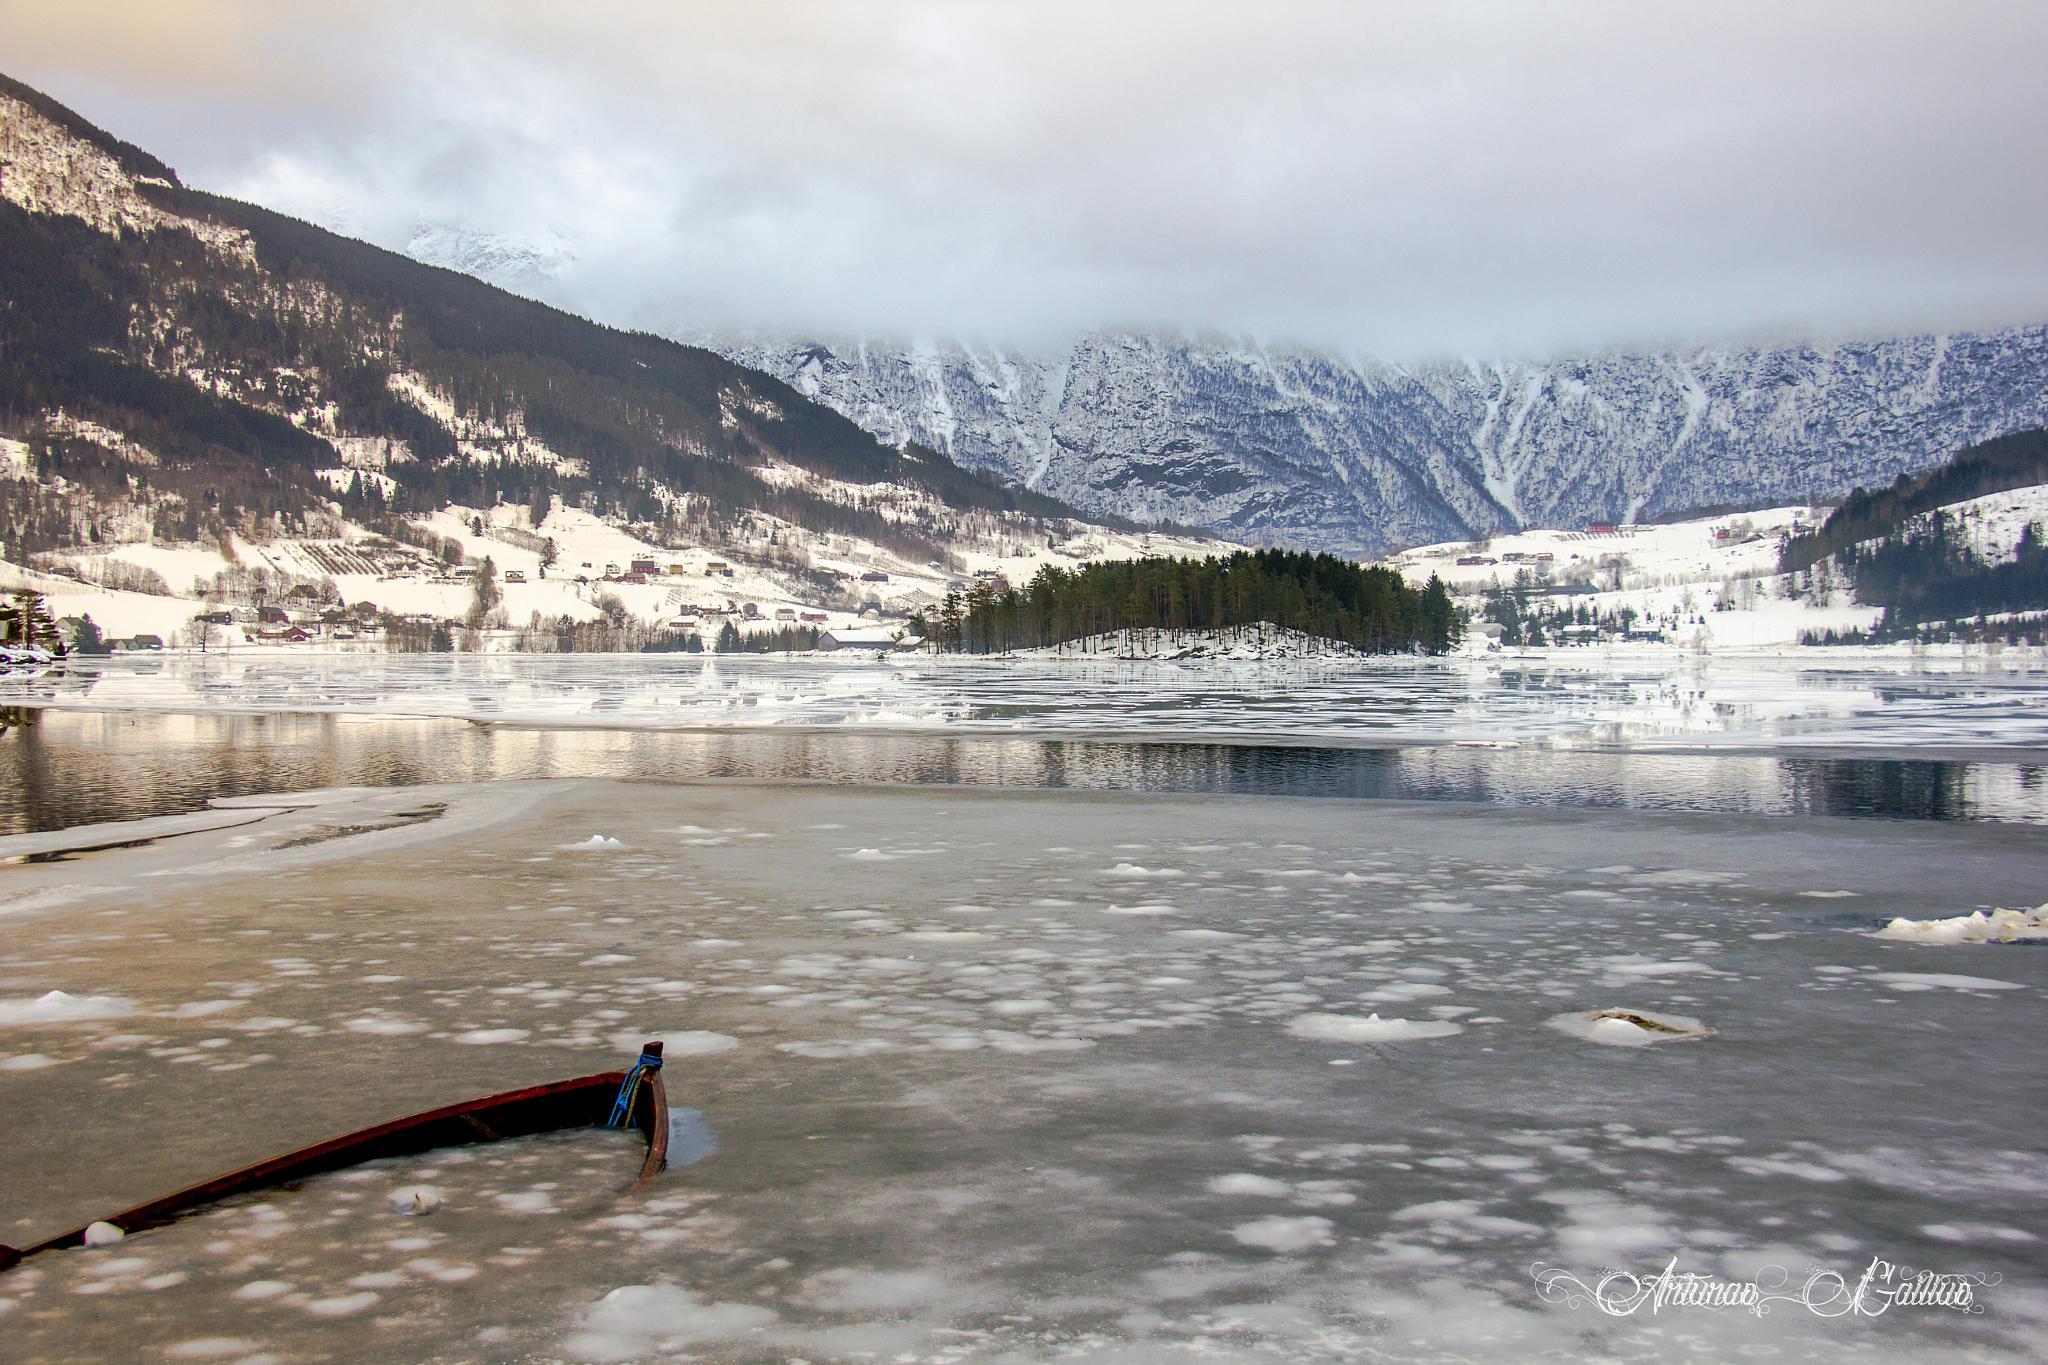 Frozen by Arturas Gailius